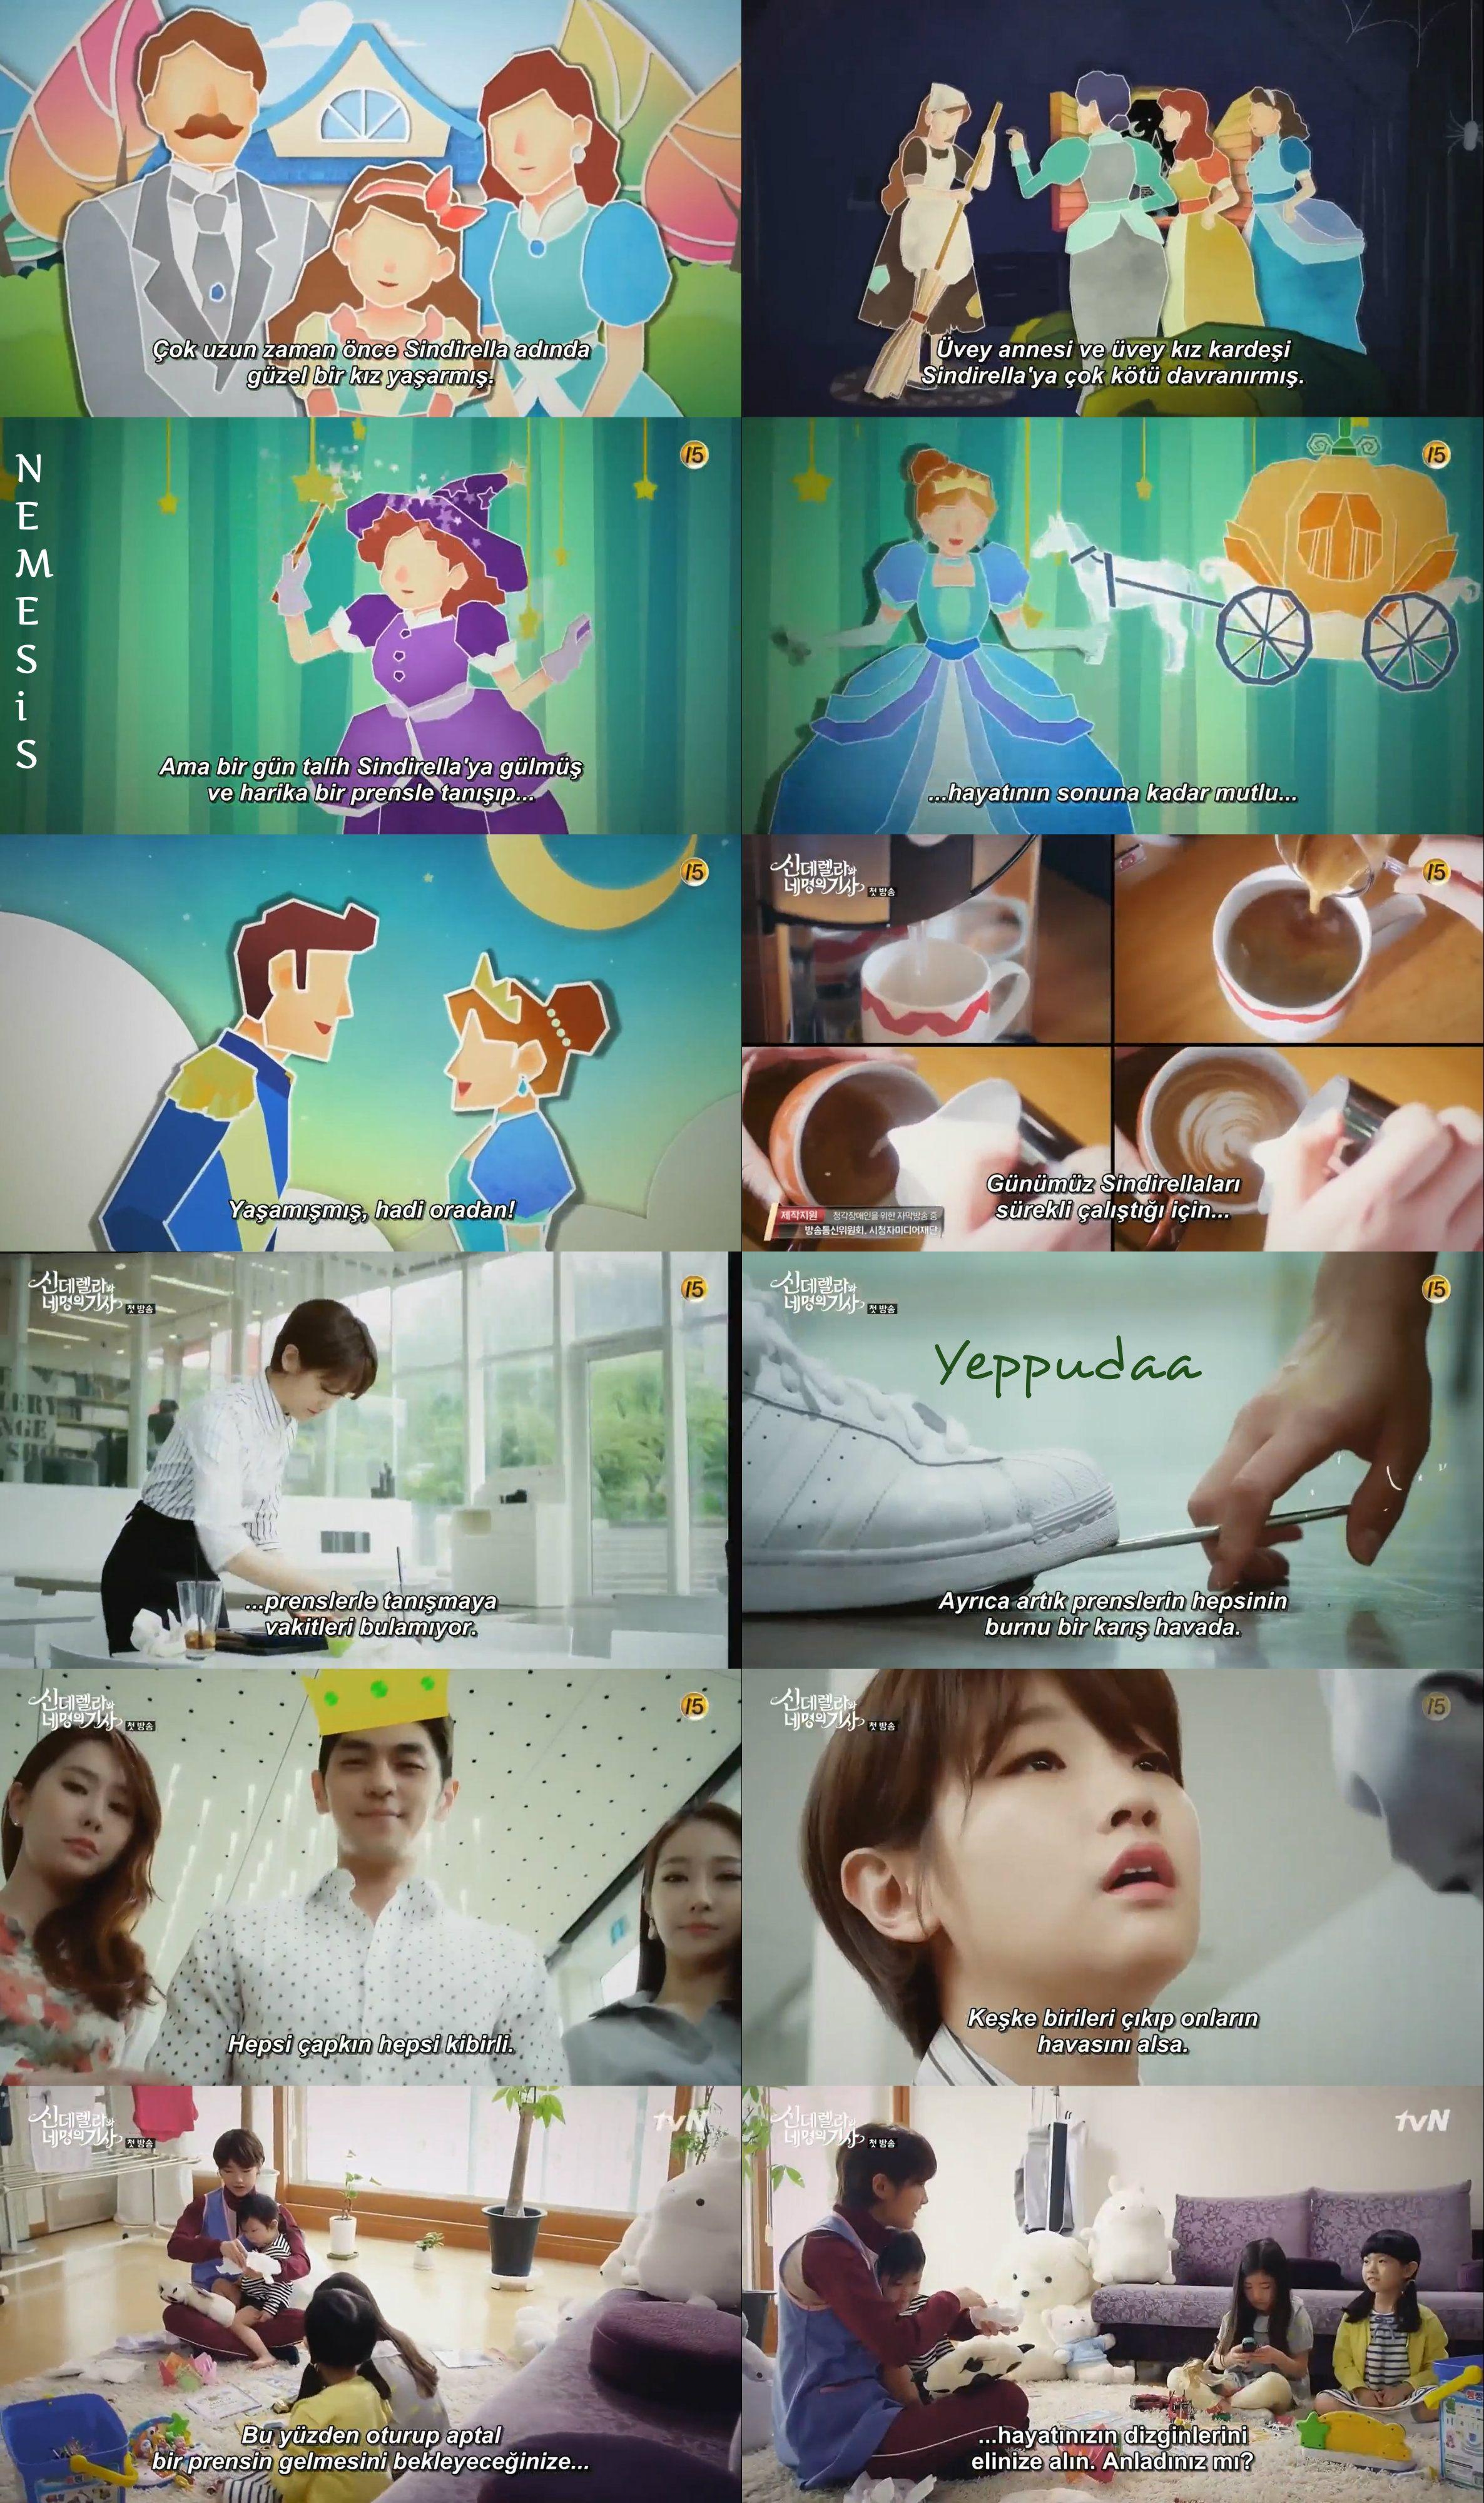 Cinderella and Four Knights | Dizi - film replikleri | Pinterest